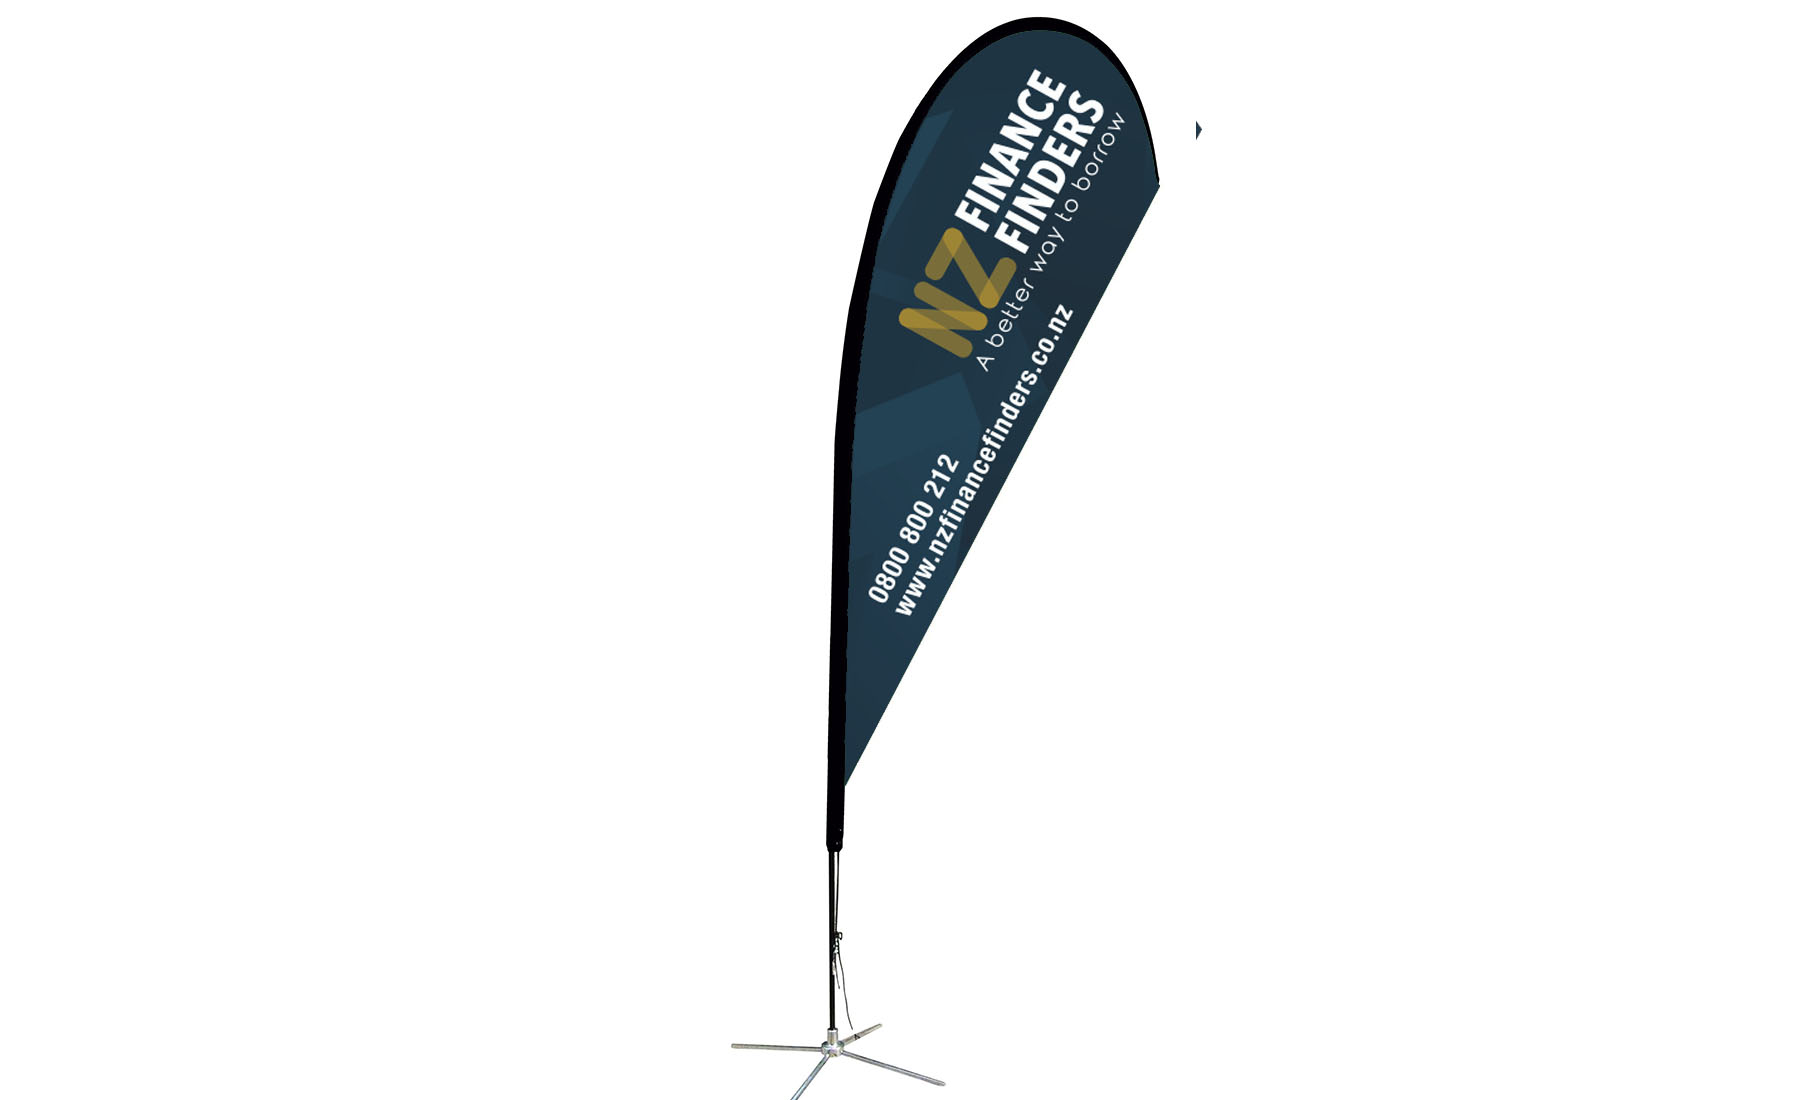 NZ Finance Finders Teardrop flag design Cre8ive Dunedin